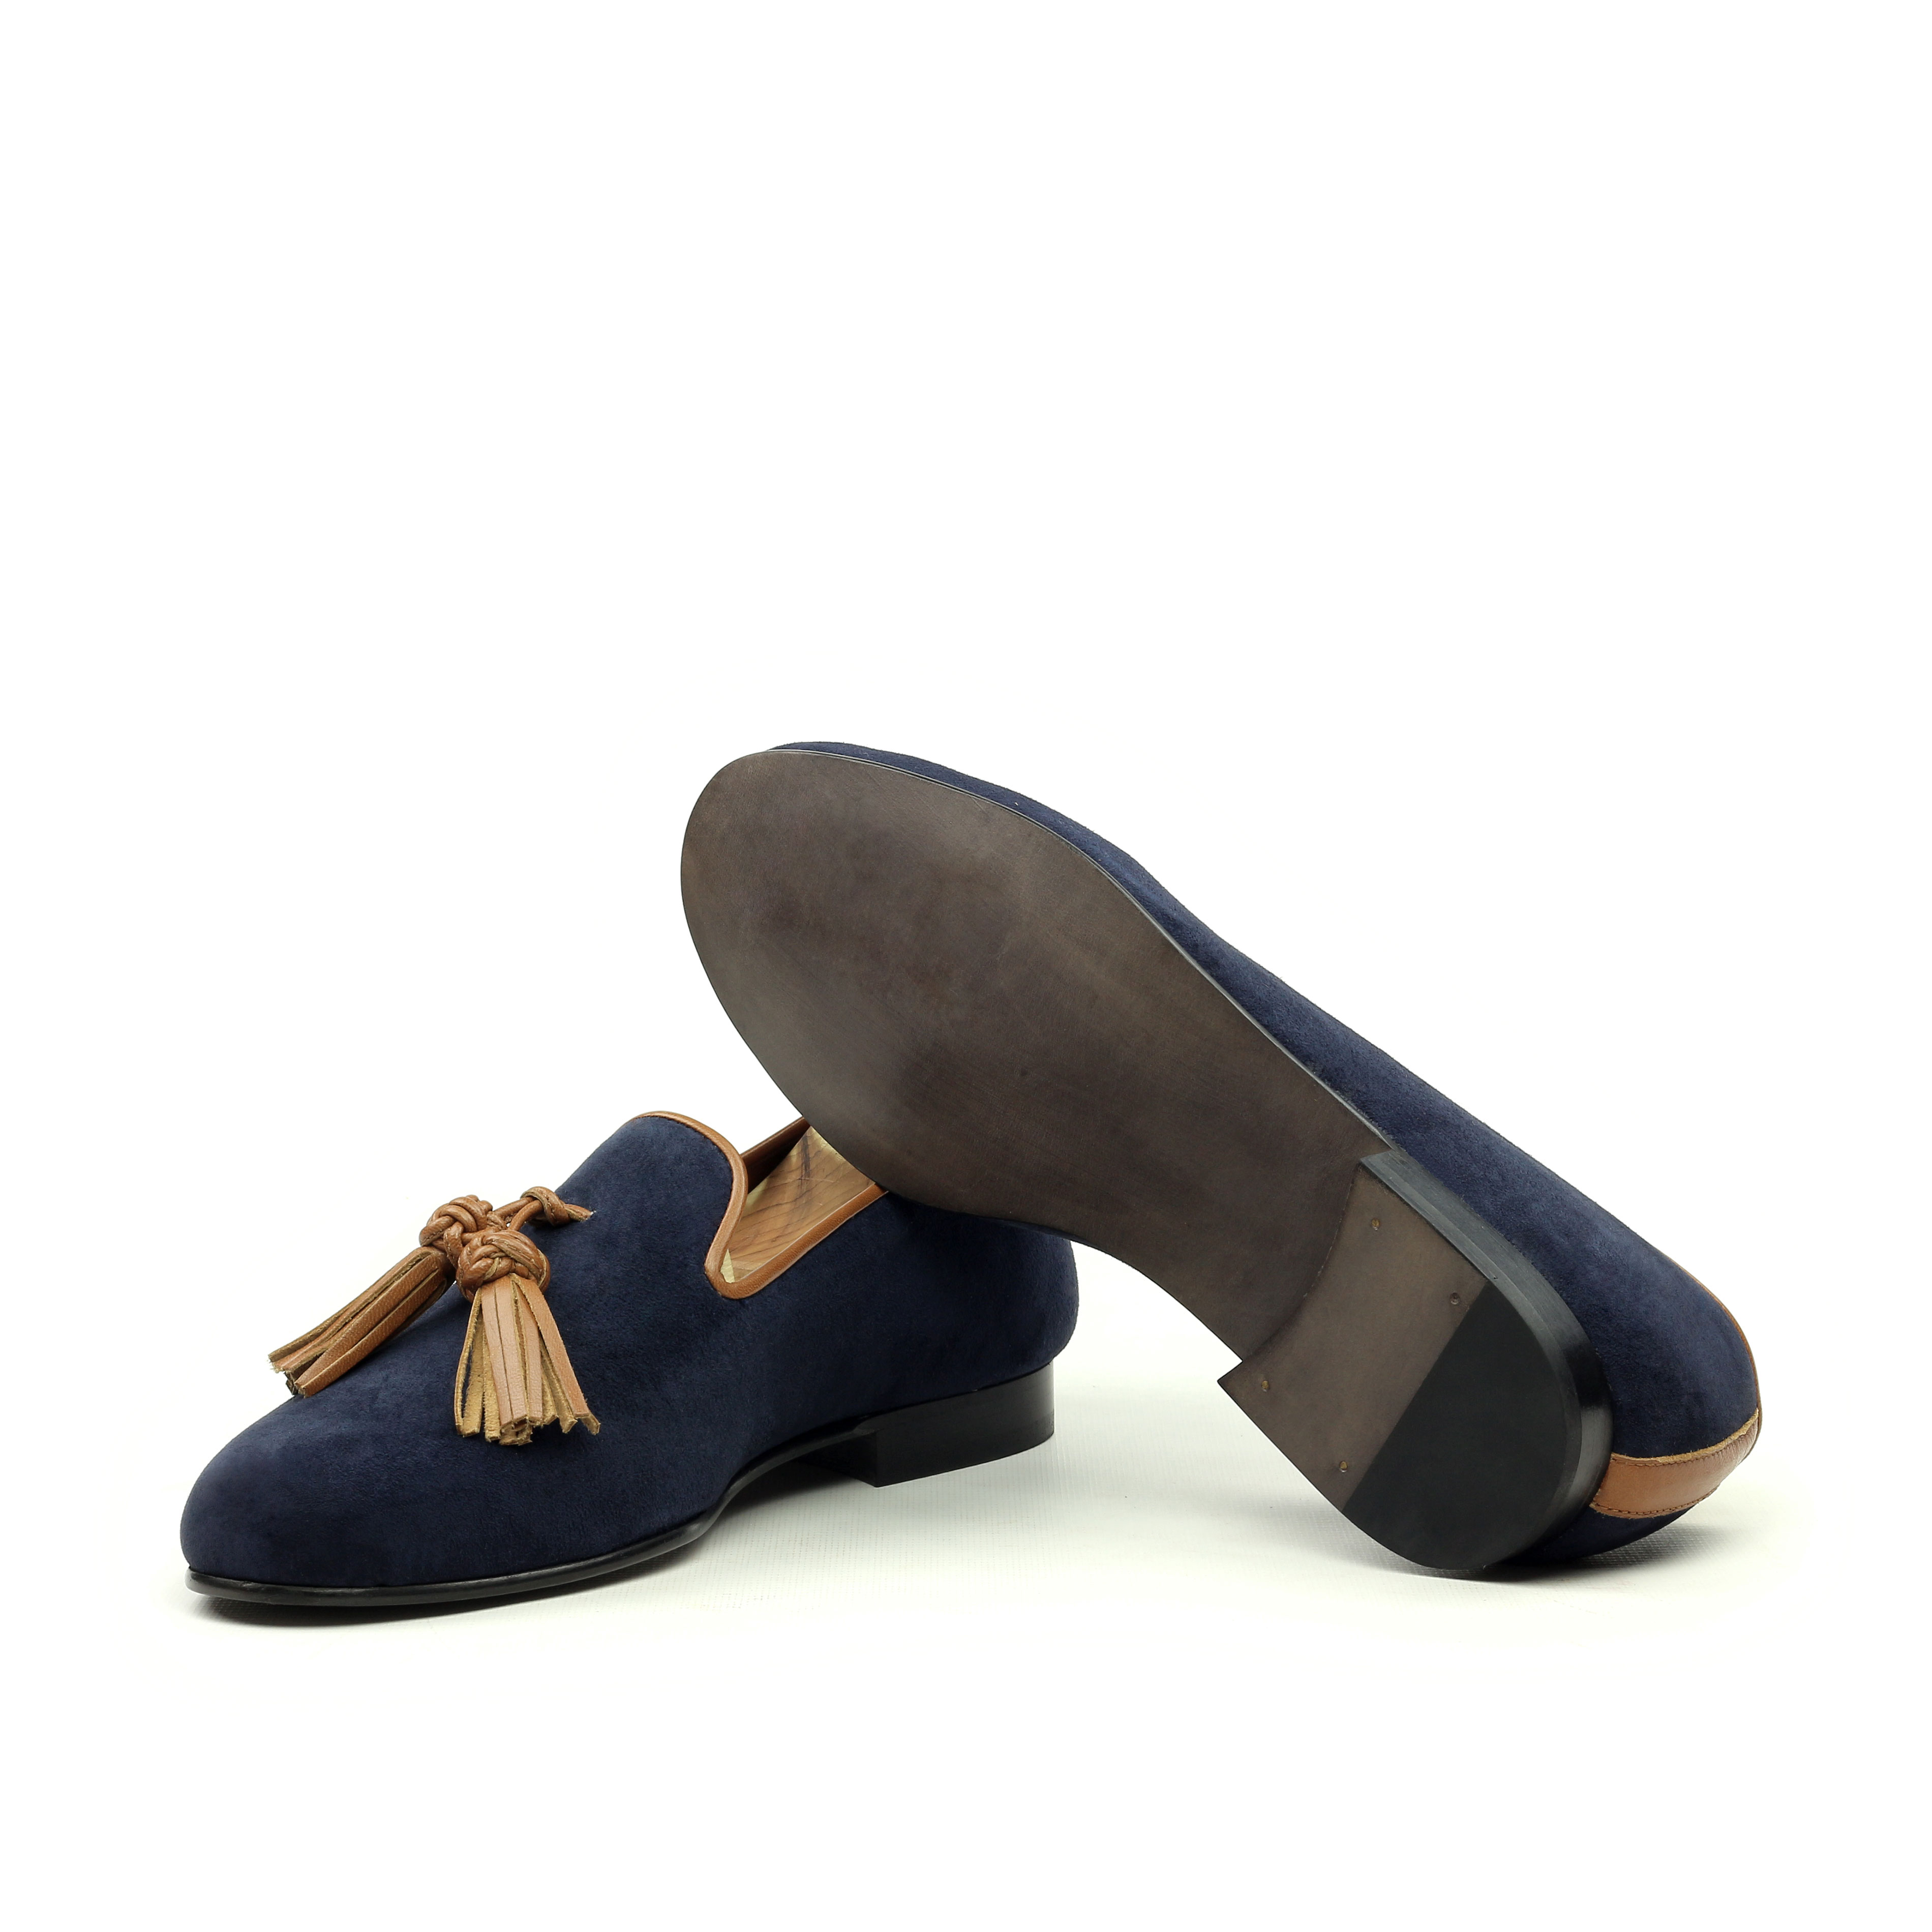 wellington-slipper-navy-suede-special-tassel_9